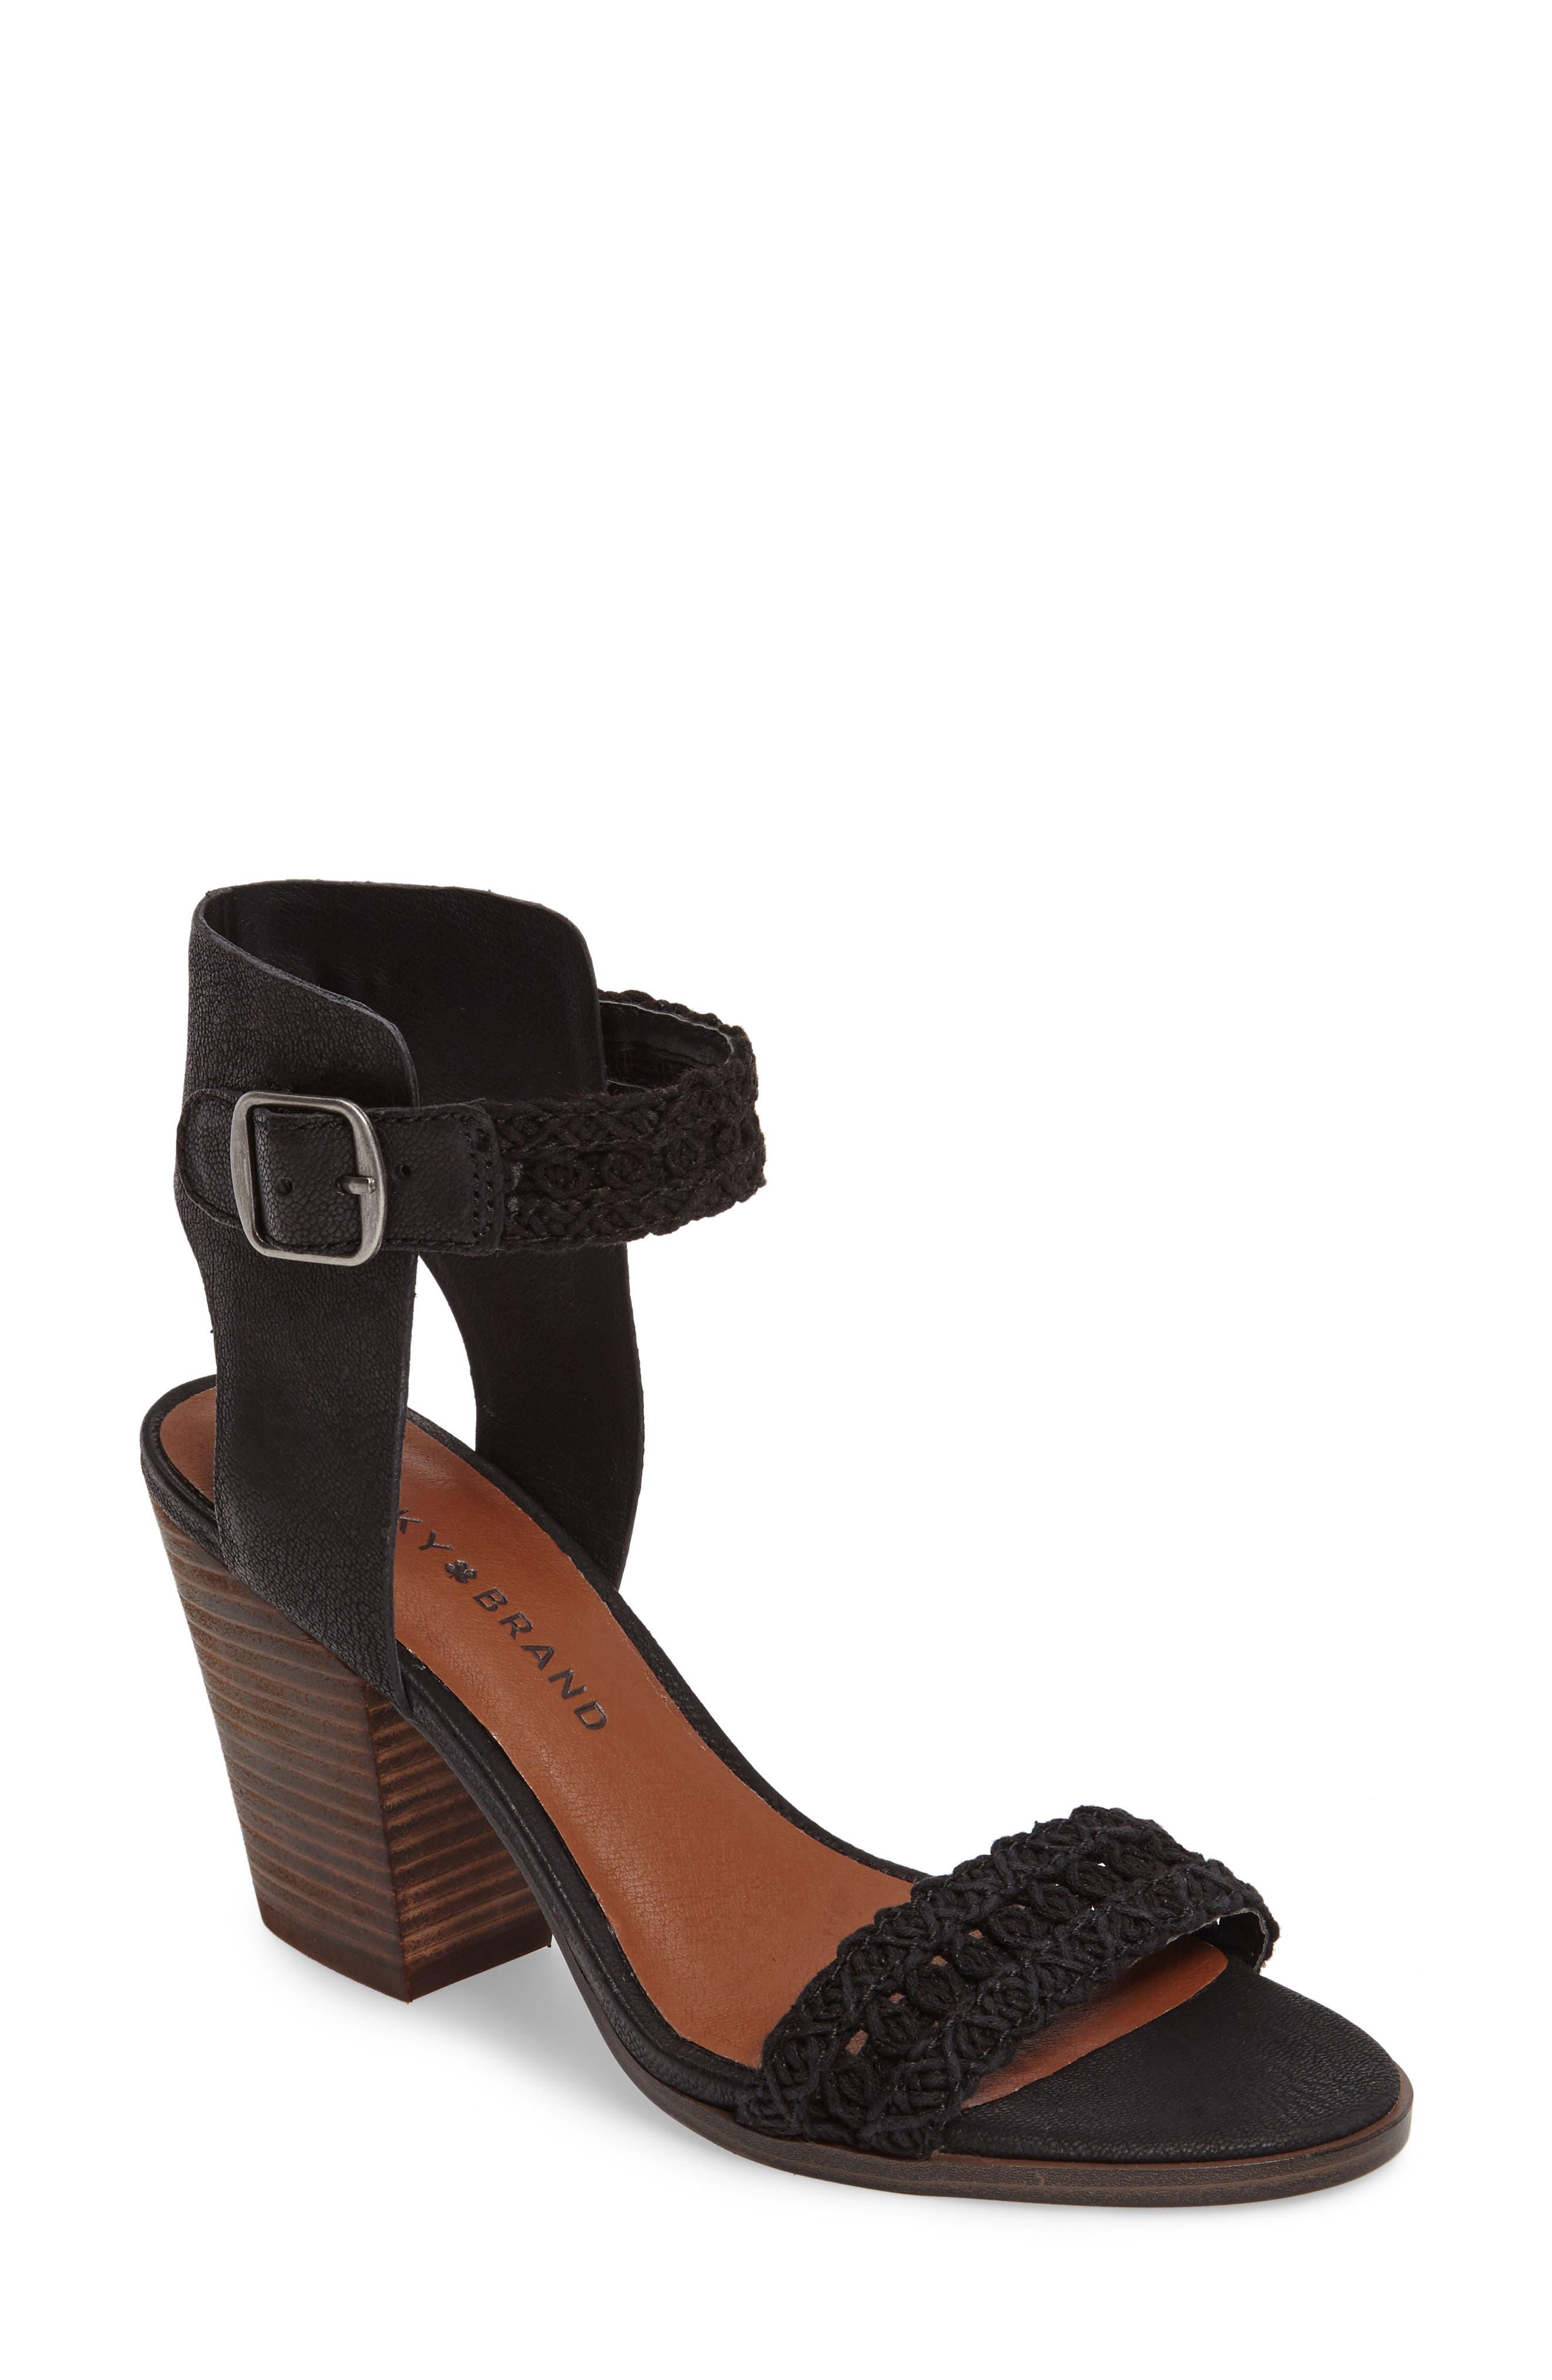 Oakes Ankle Strap Sandal,                         Main,                         color, Black Leather